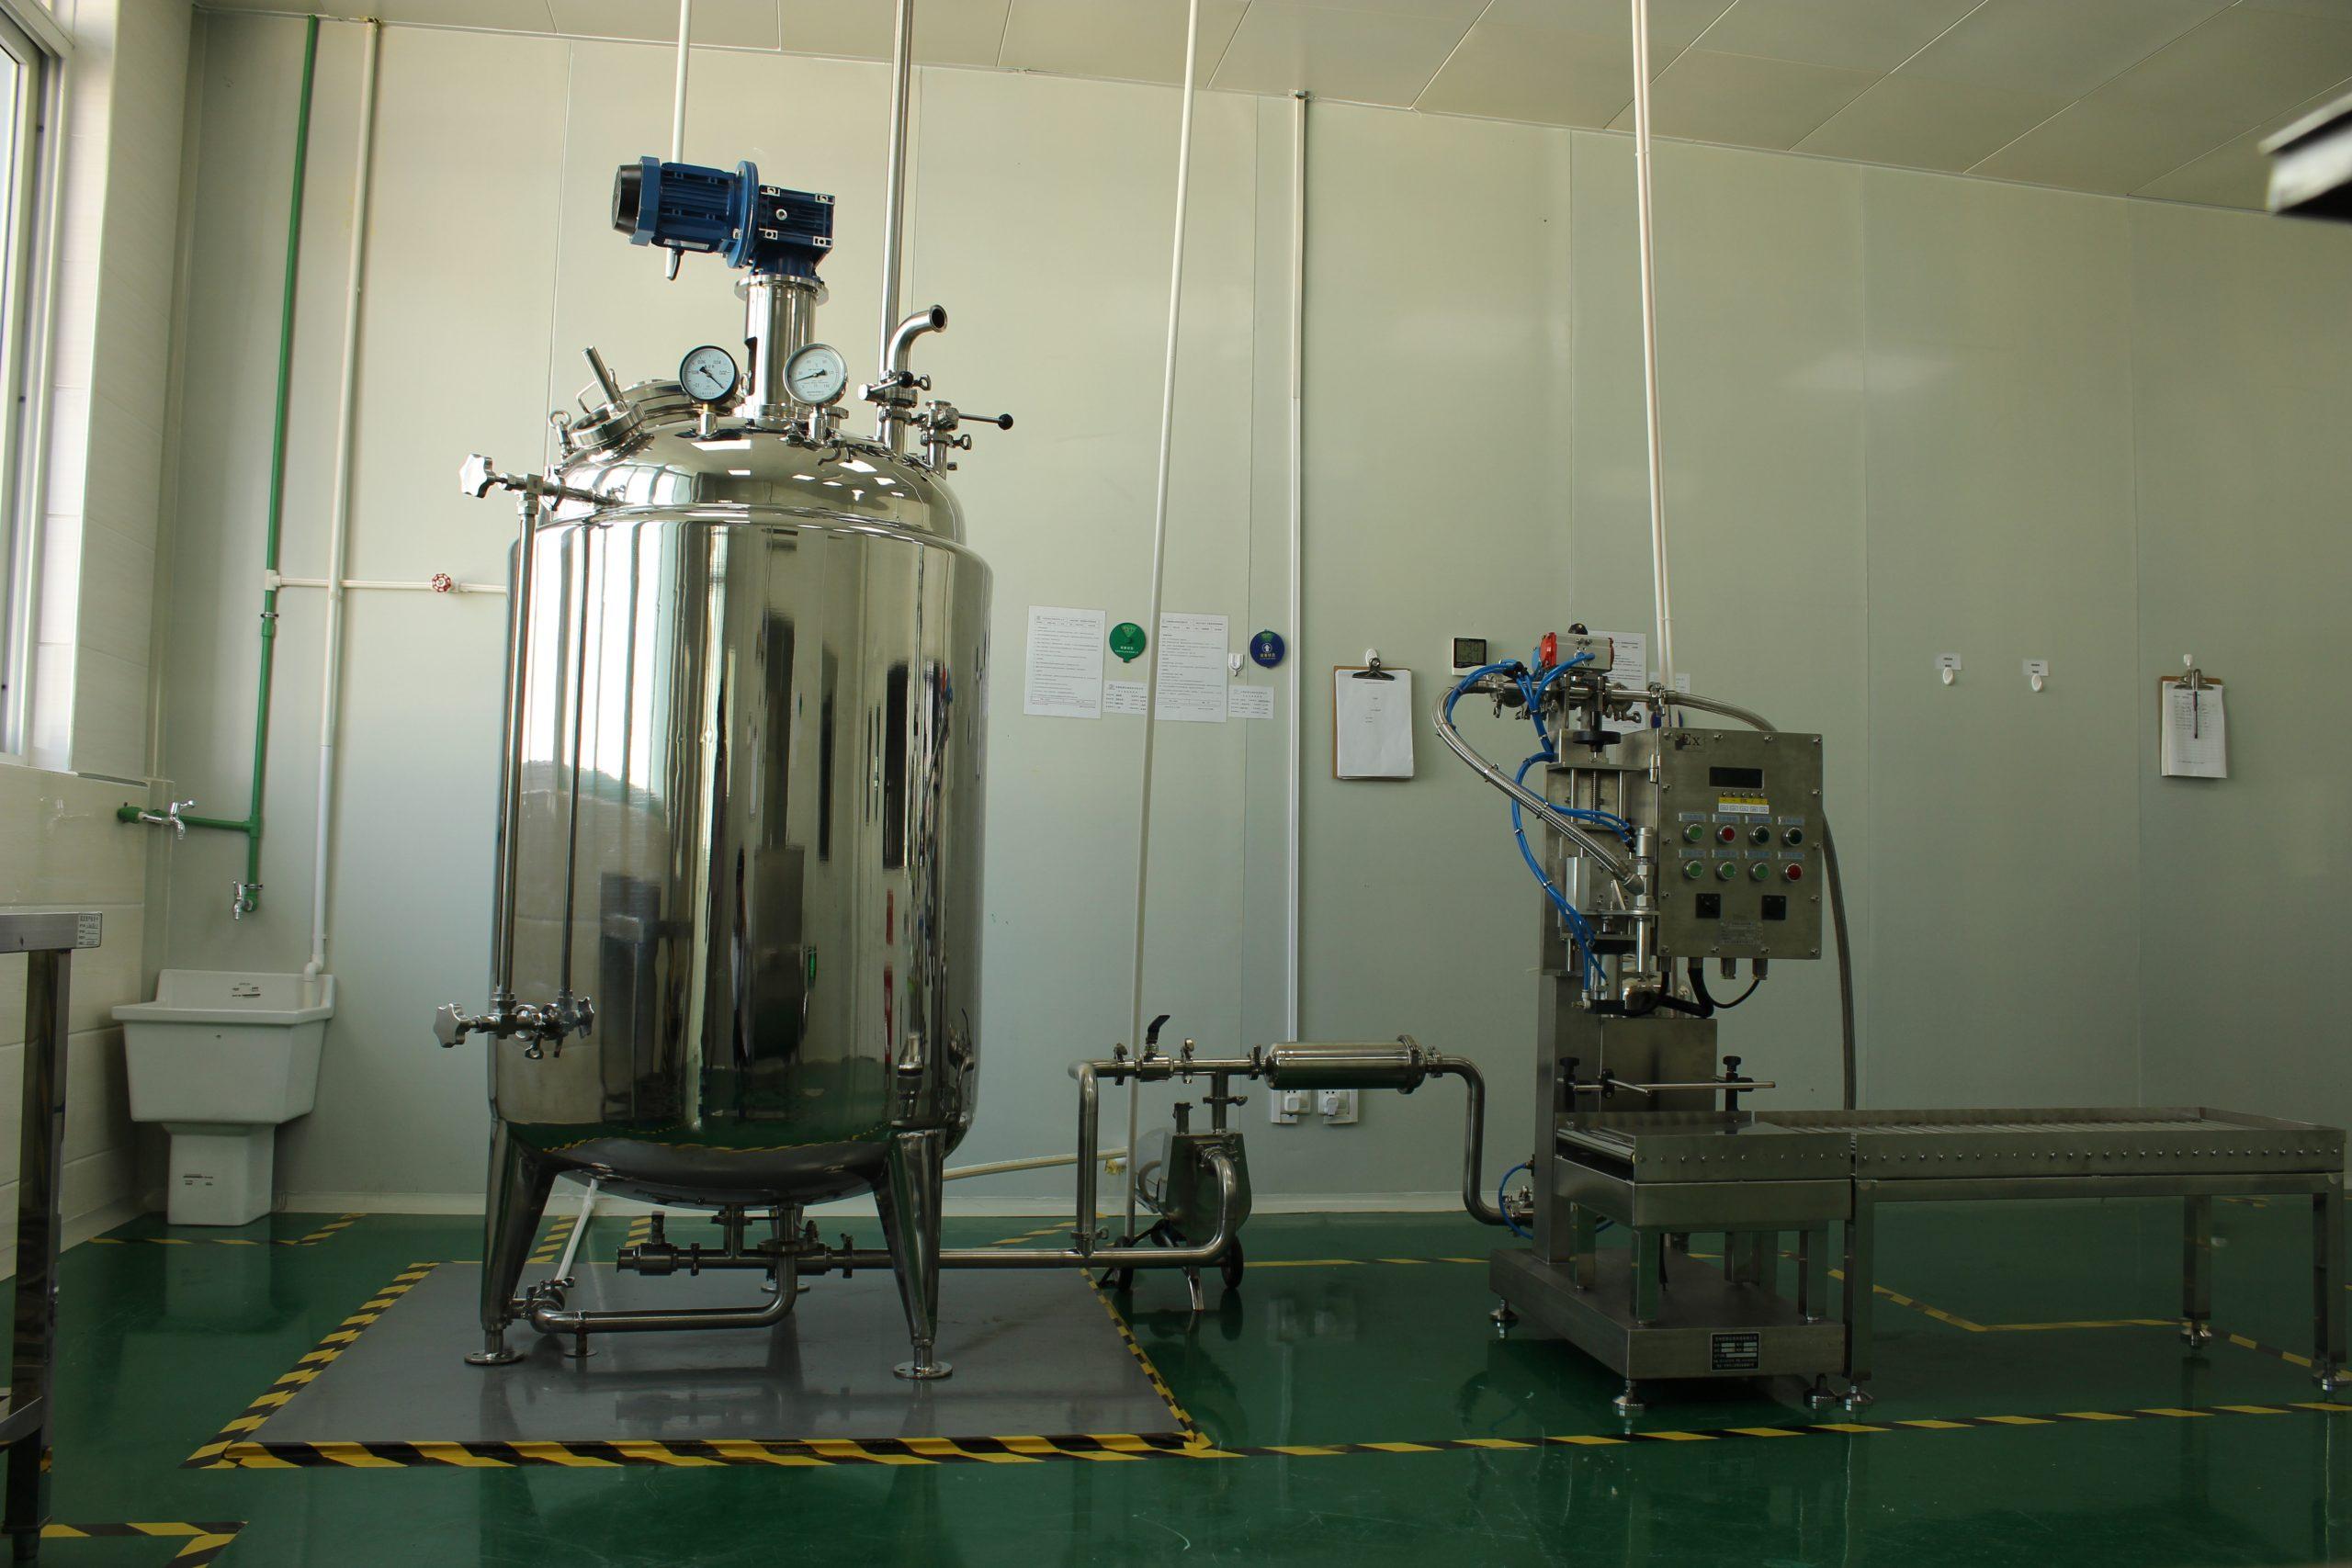 garlic oil production equipment